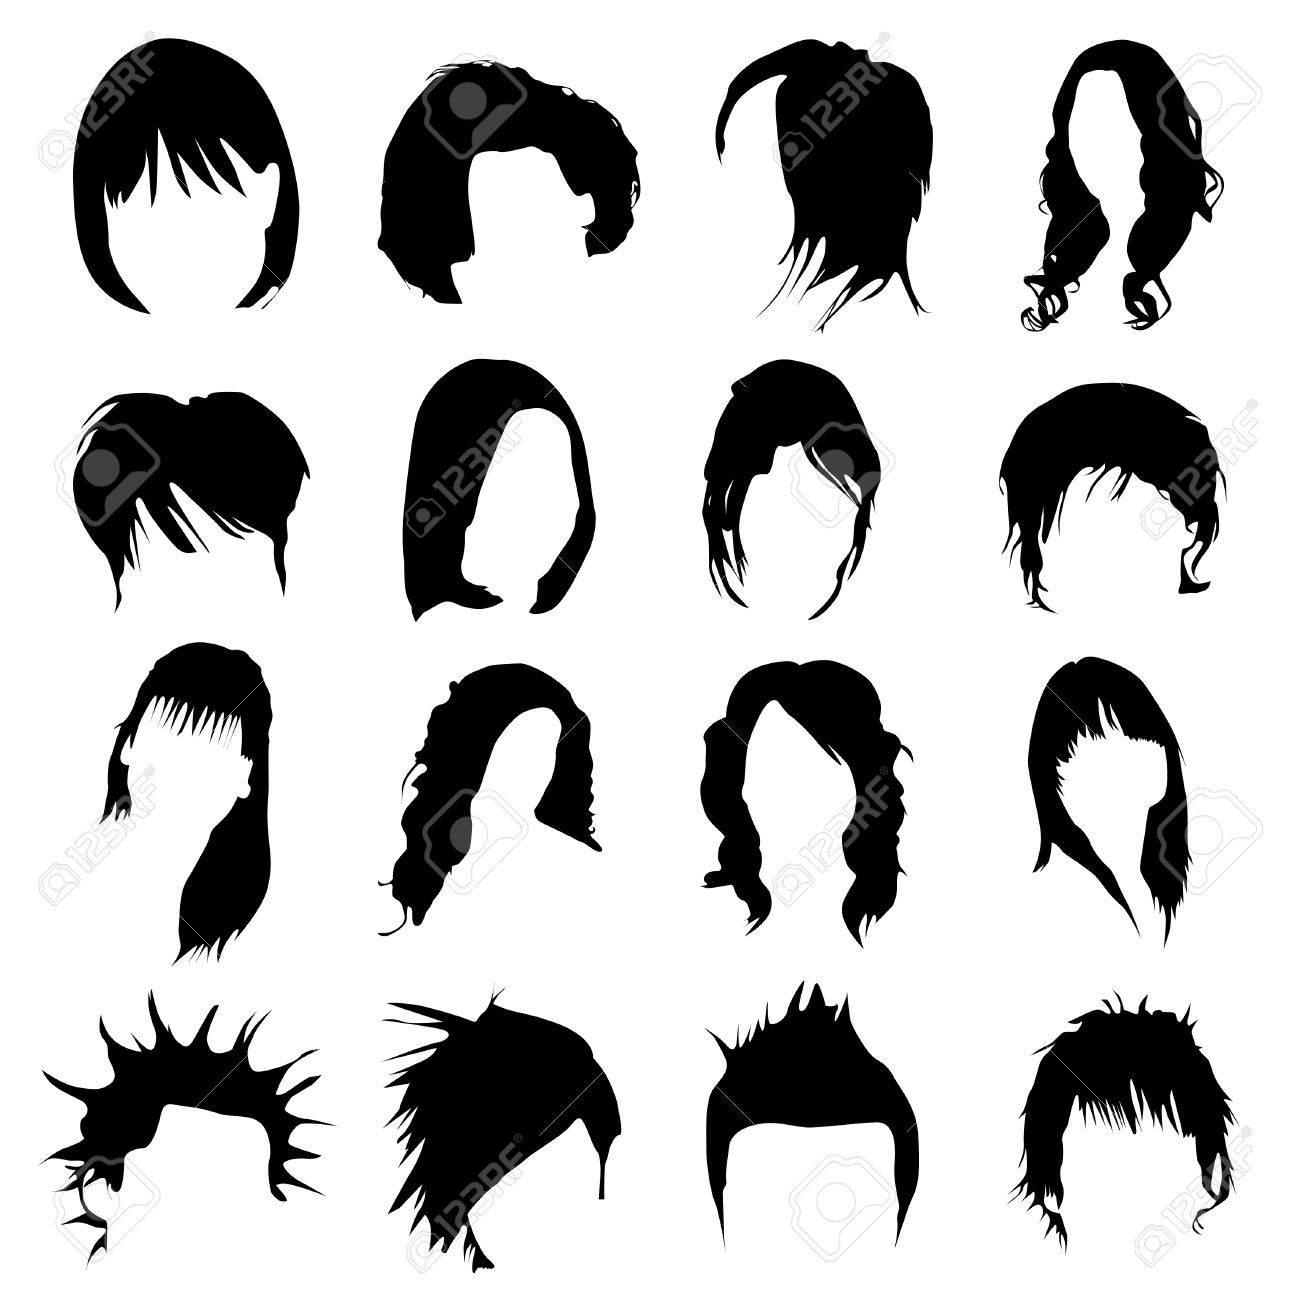 hair design vector (women and men) Stock Vector - 9345655